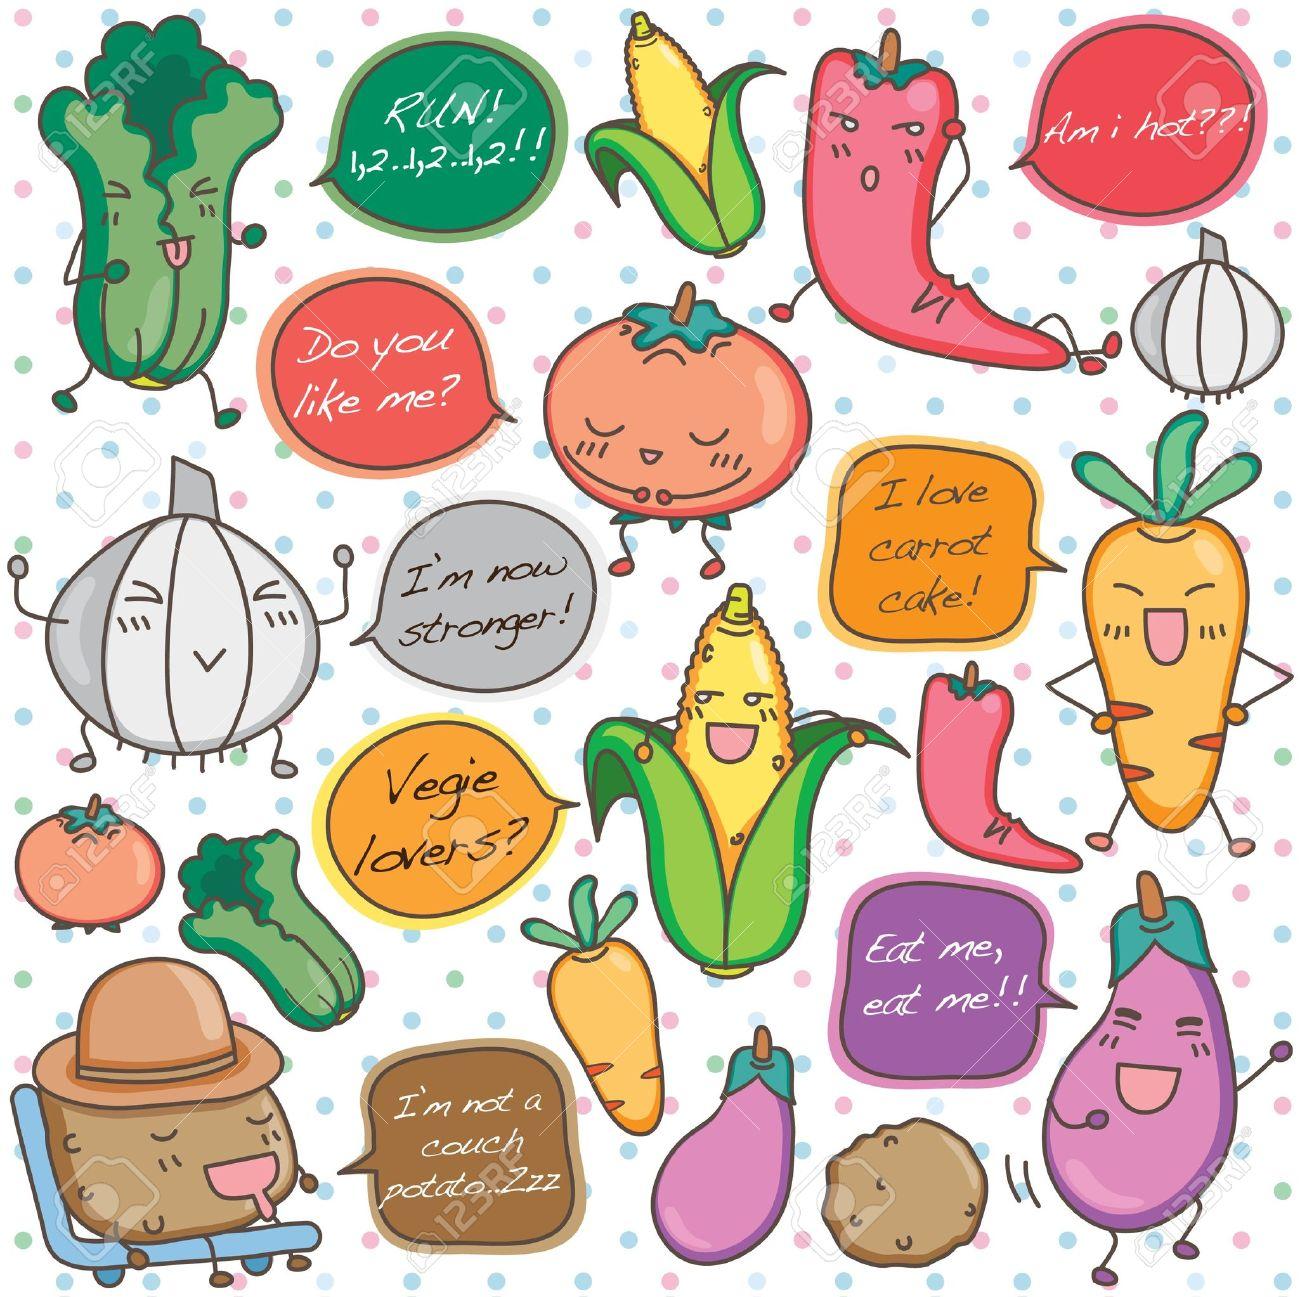 Vegetables Clip Art Images | Clipart Panda - Free Clipart Images